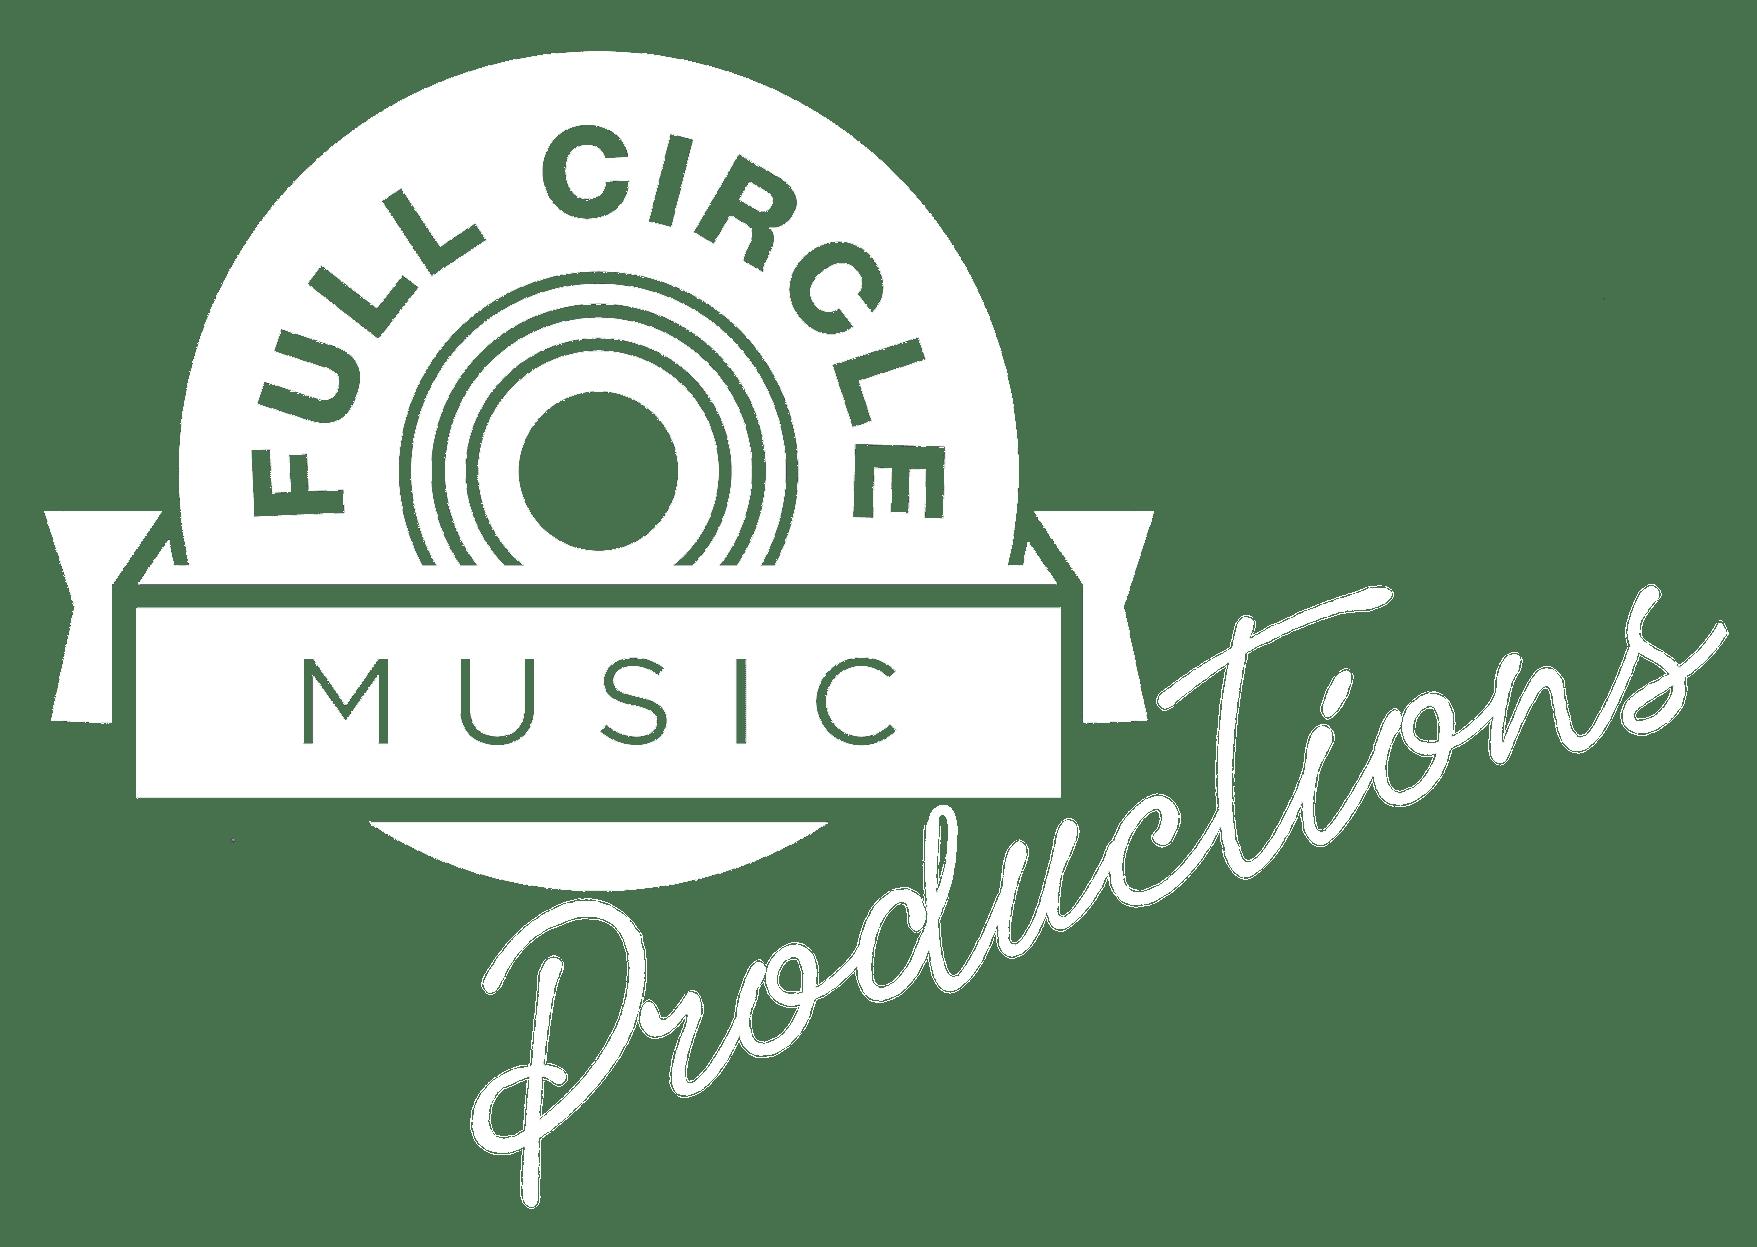 Full Circle Music Productions